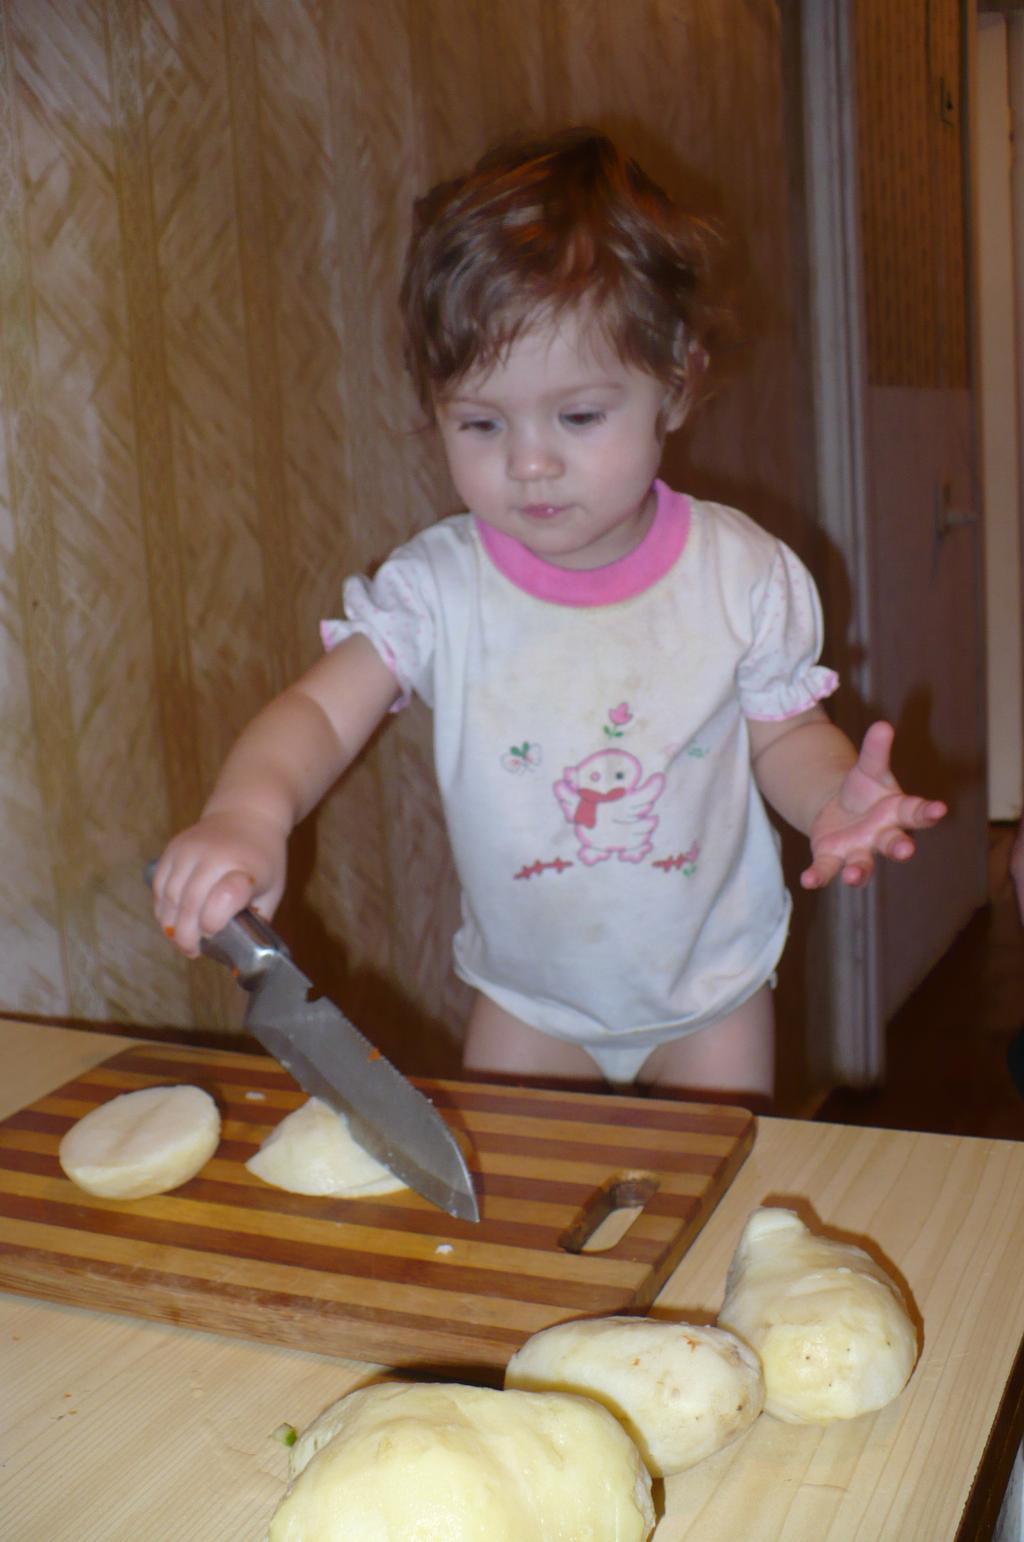 Салат оливье! Готовим деду вкуснятину на 23 феврал. Юные кулинары